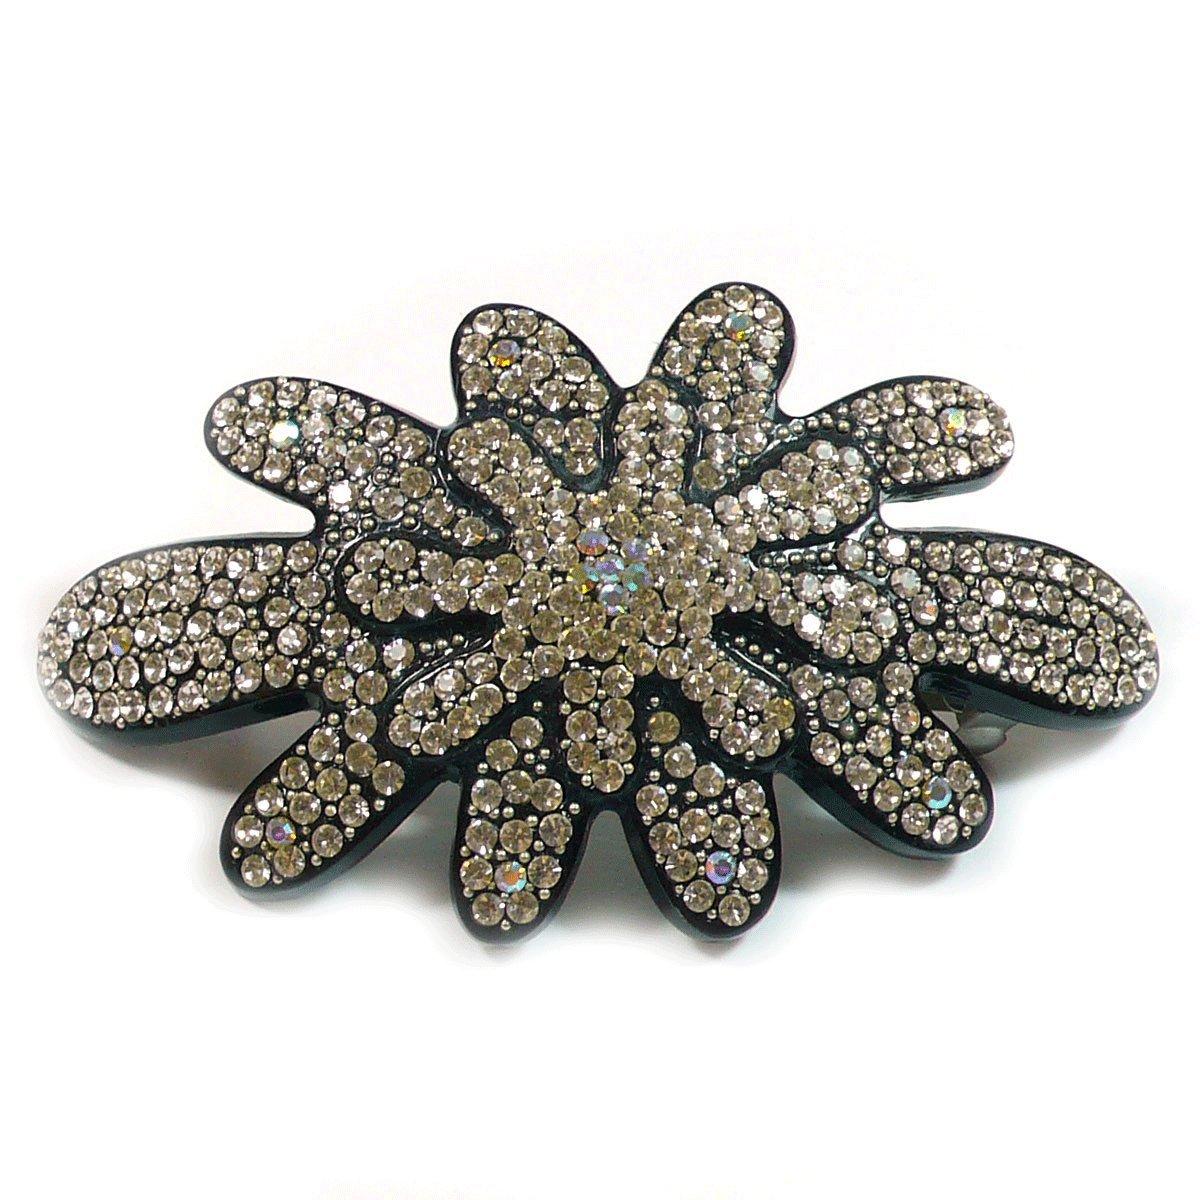 Teri's Boutique Women's Double Layer Flowers Clear Rhinestone Barette Hair Clip Pin Black